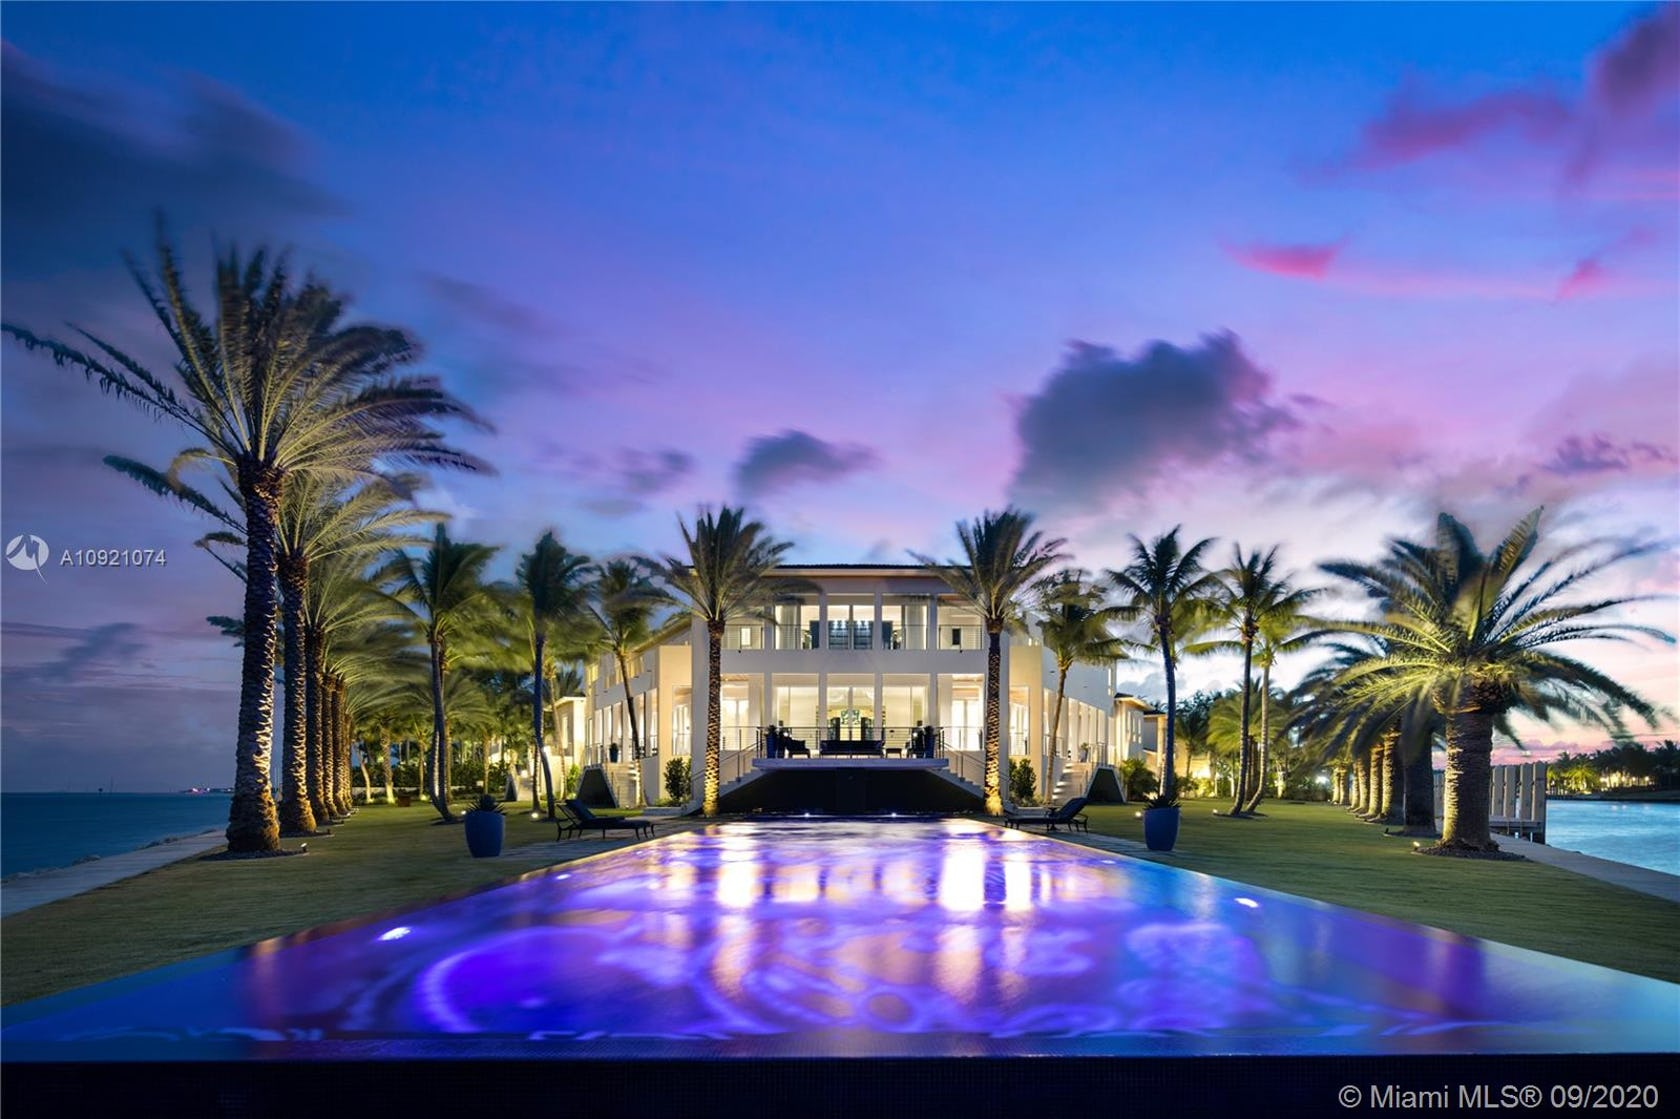 resort hotel building